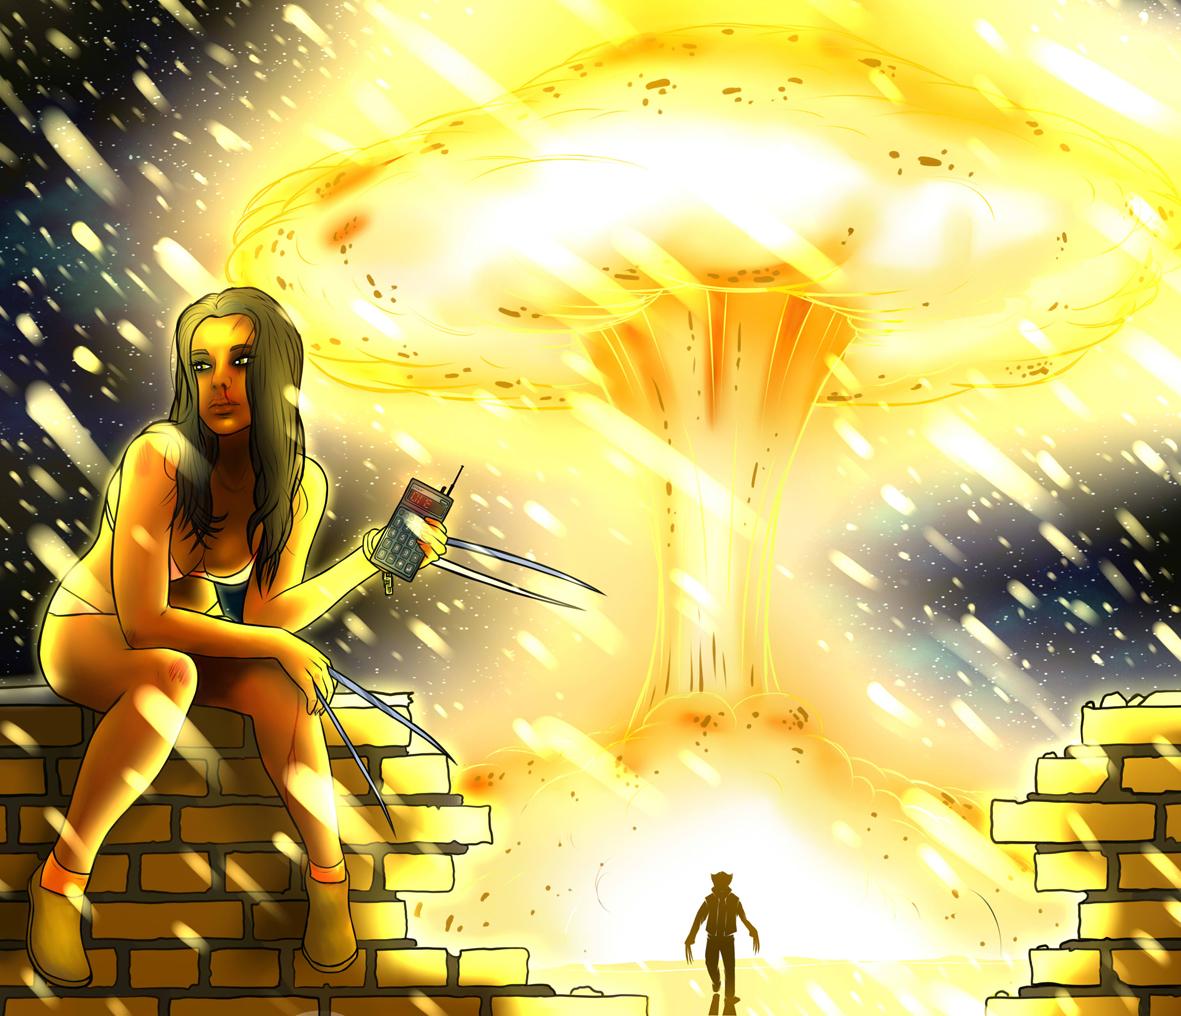 X-23 Detonation